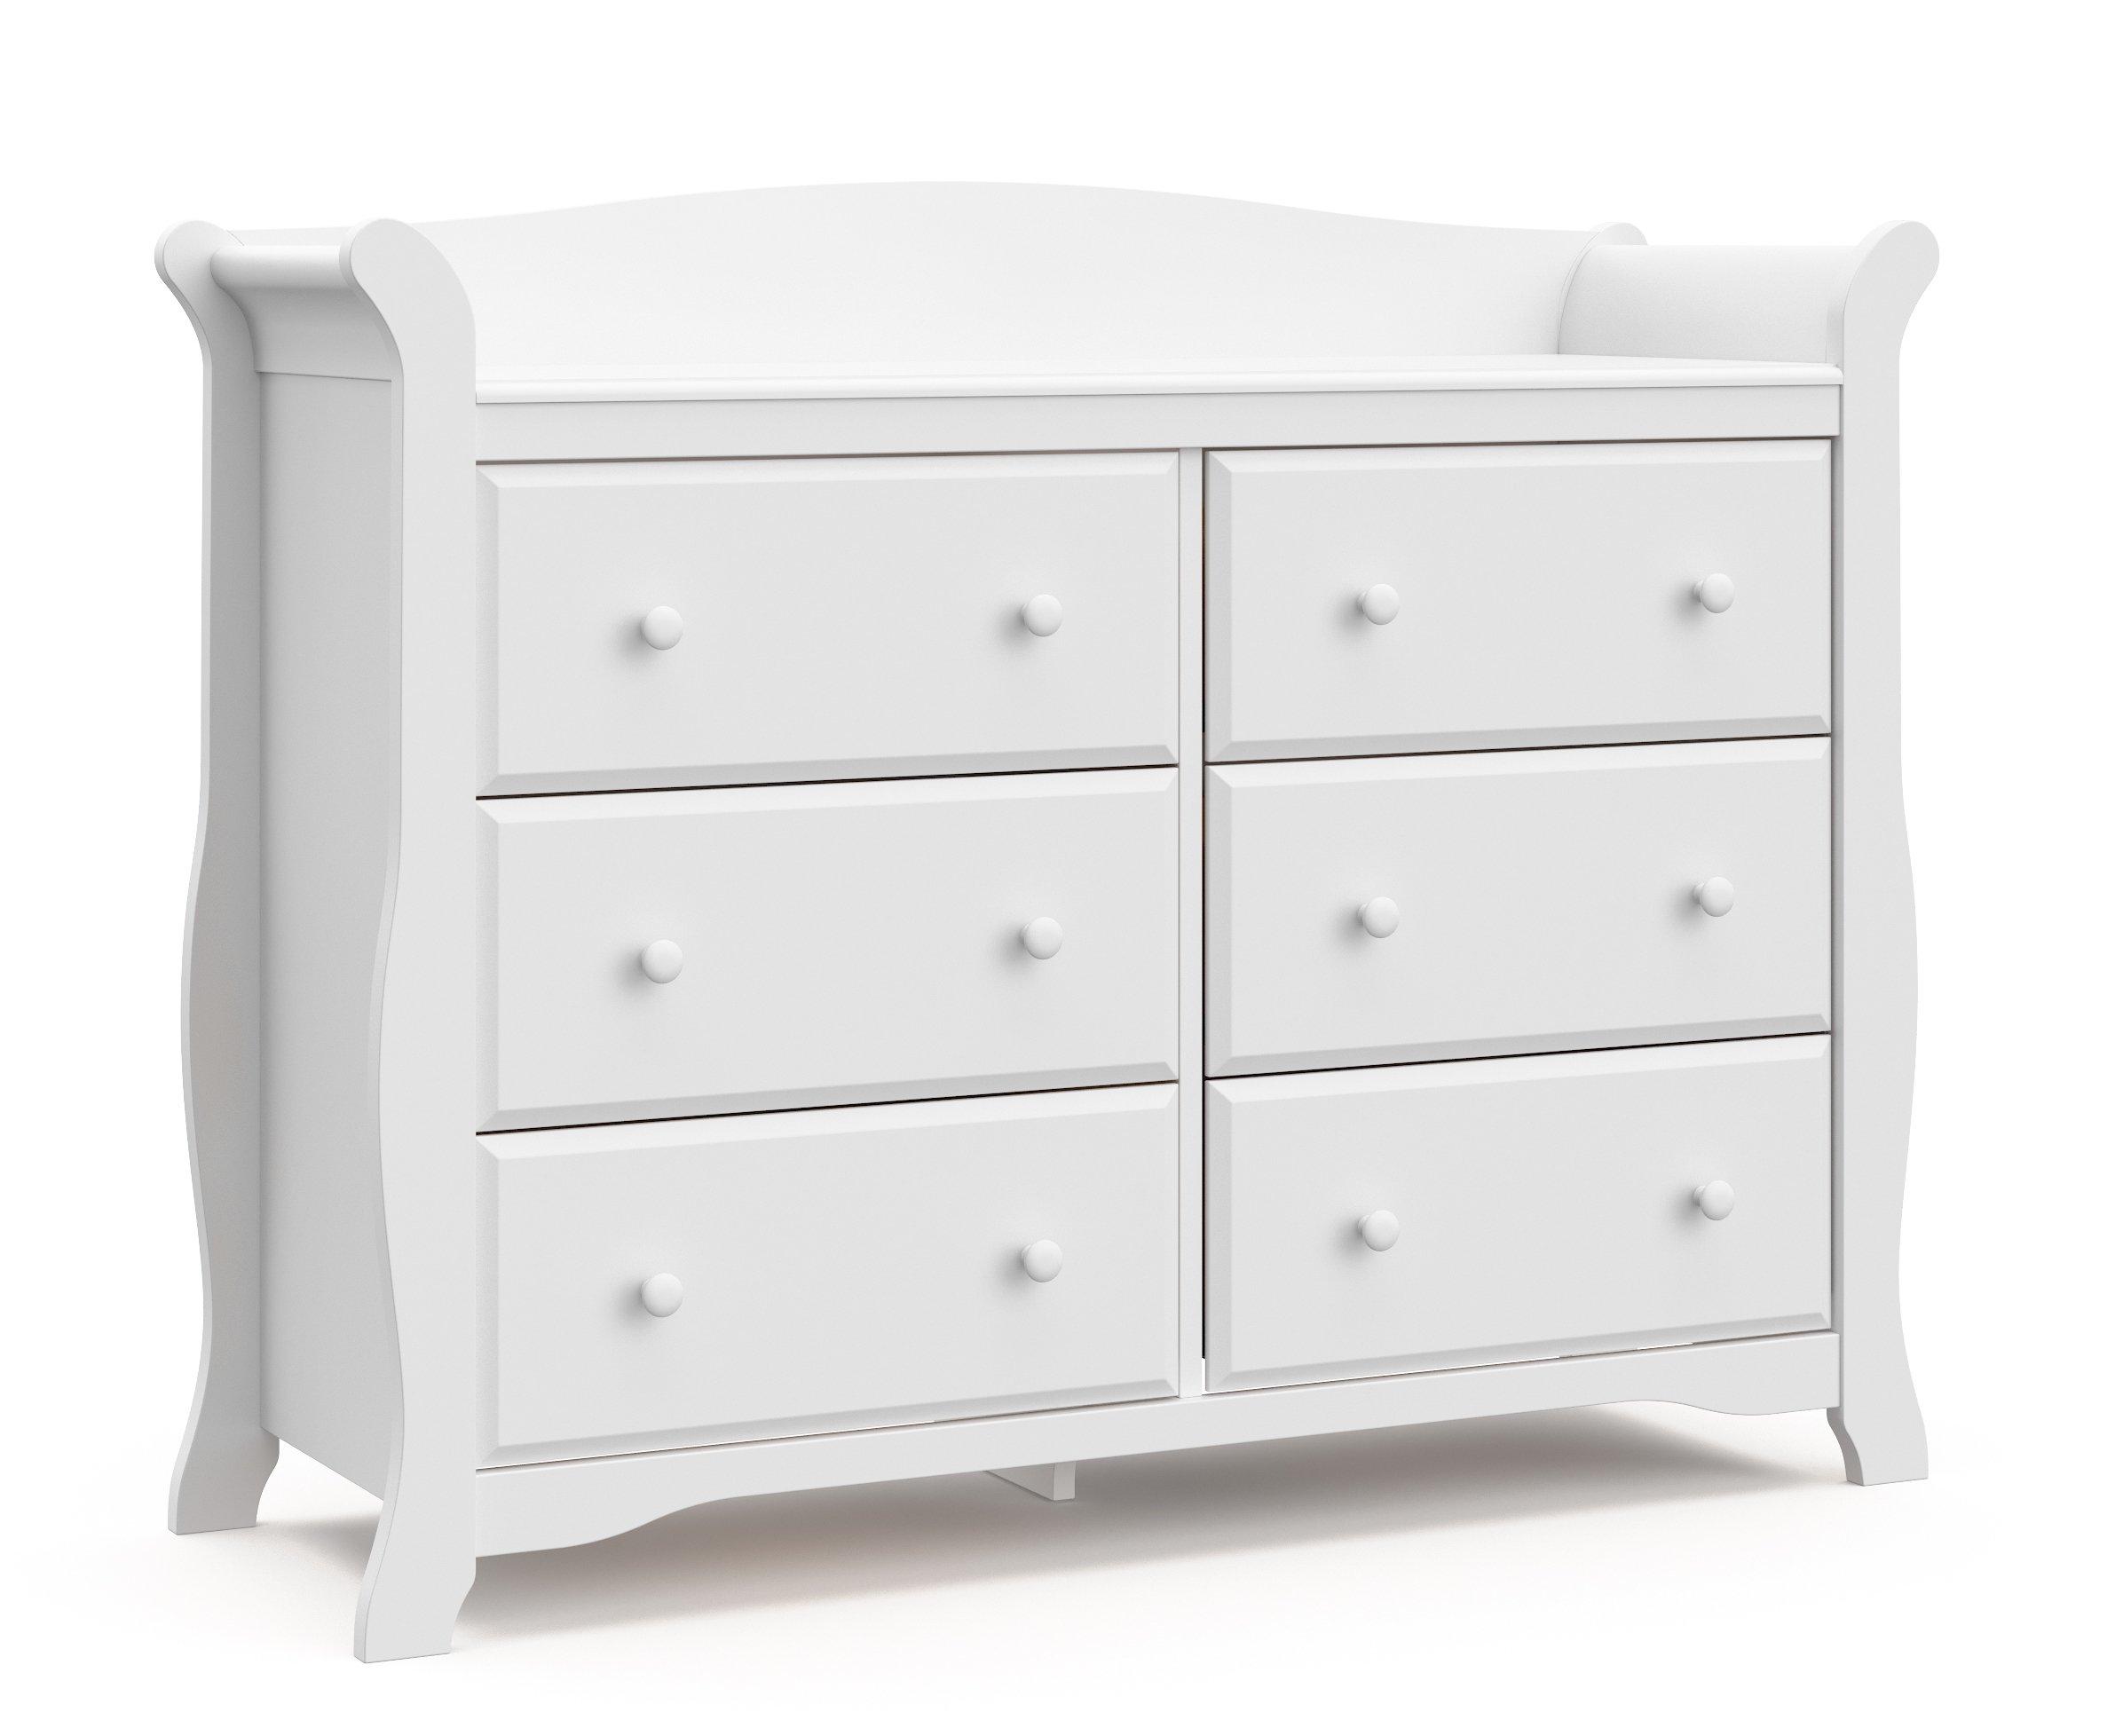 Storkcraft Avalon 6 Drawer Universal Dresser, White by Storkcraft